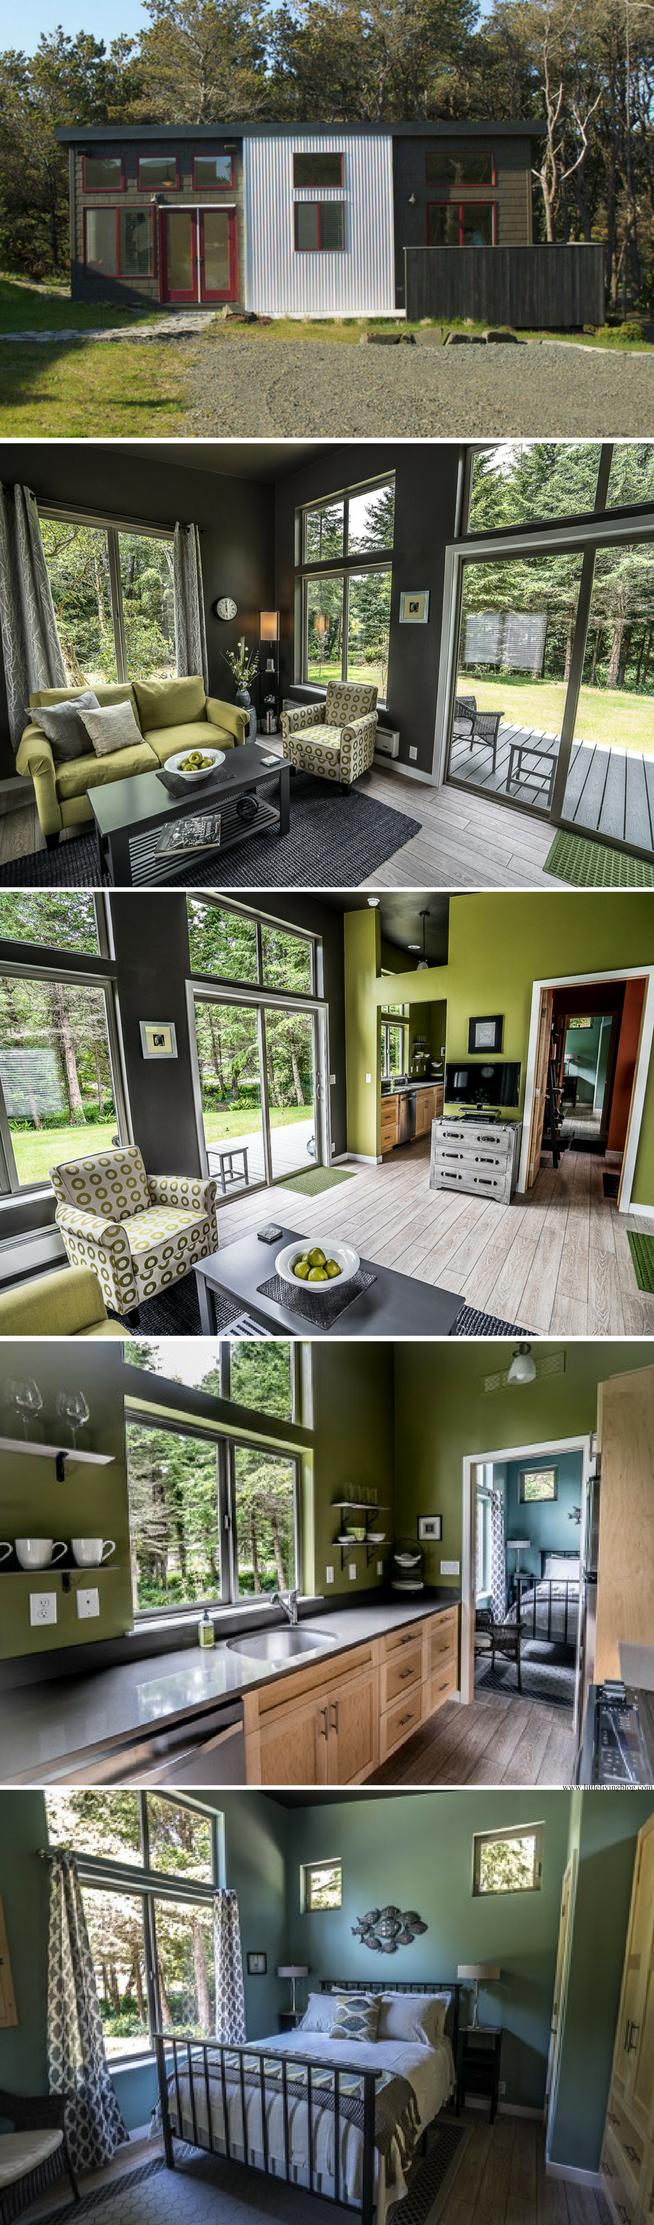 The northwest prefab home from ideabox sq ft tiny house livingtiny bedroomsmall also rh pinterest